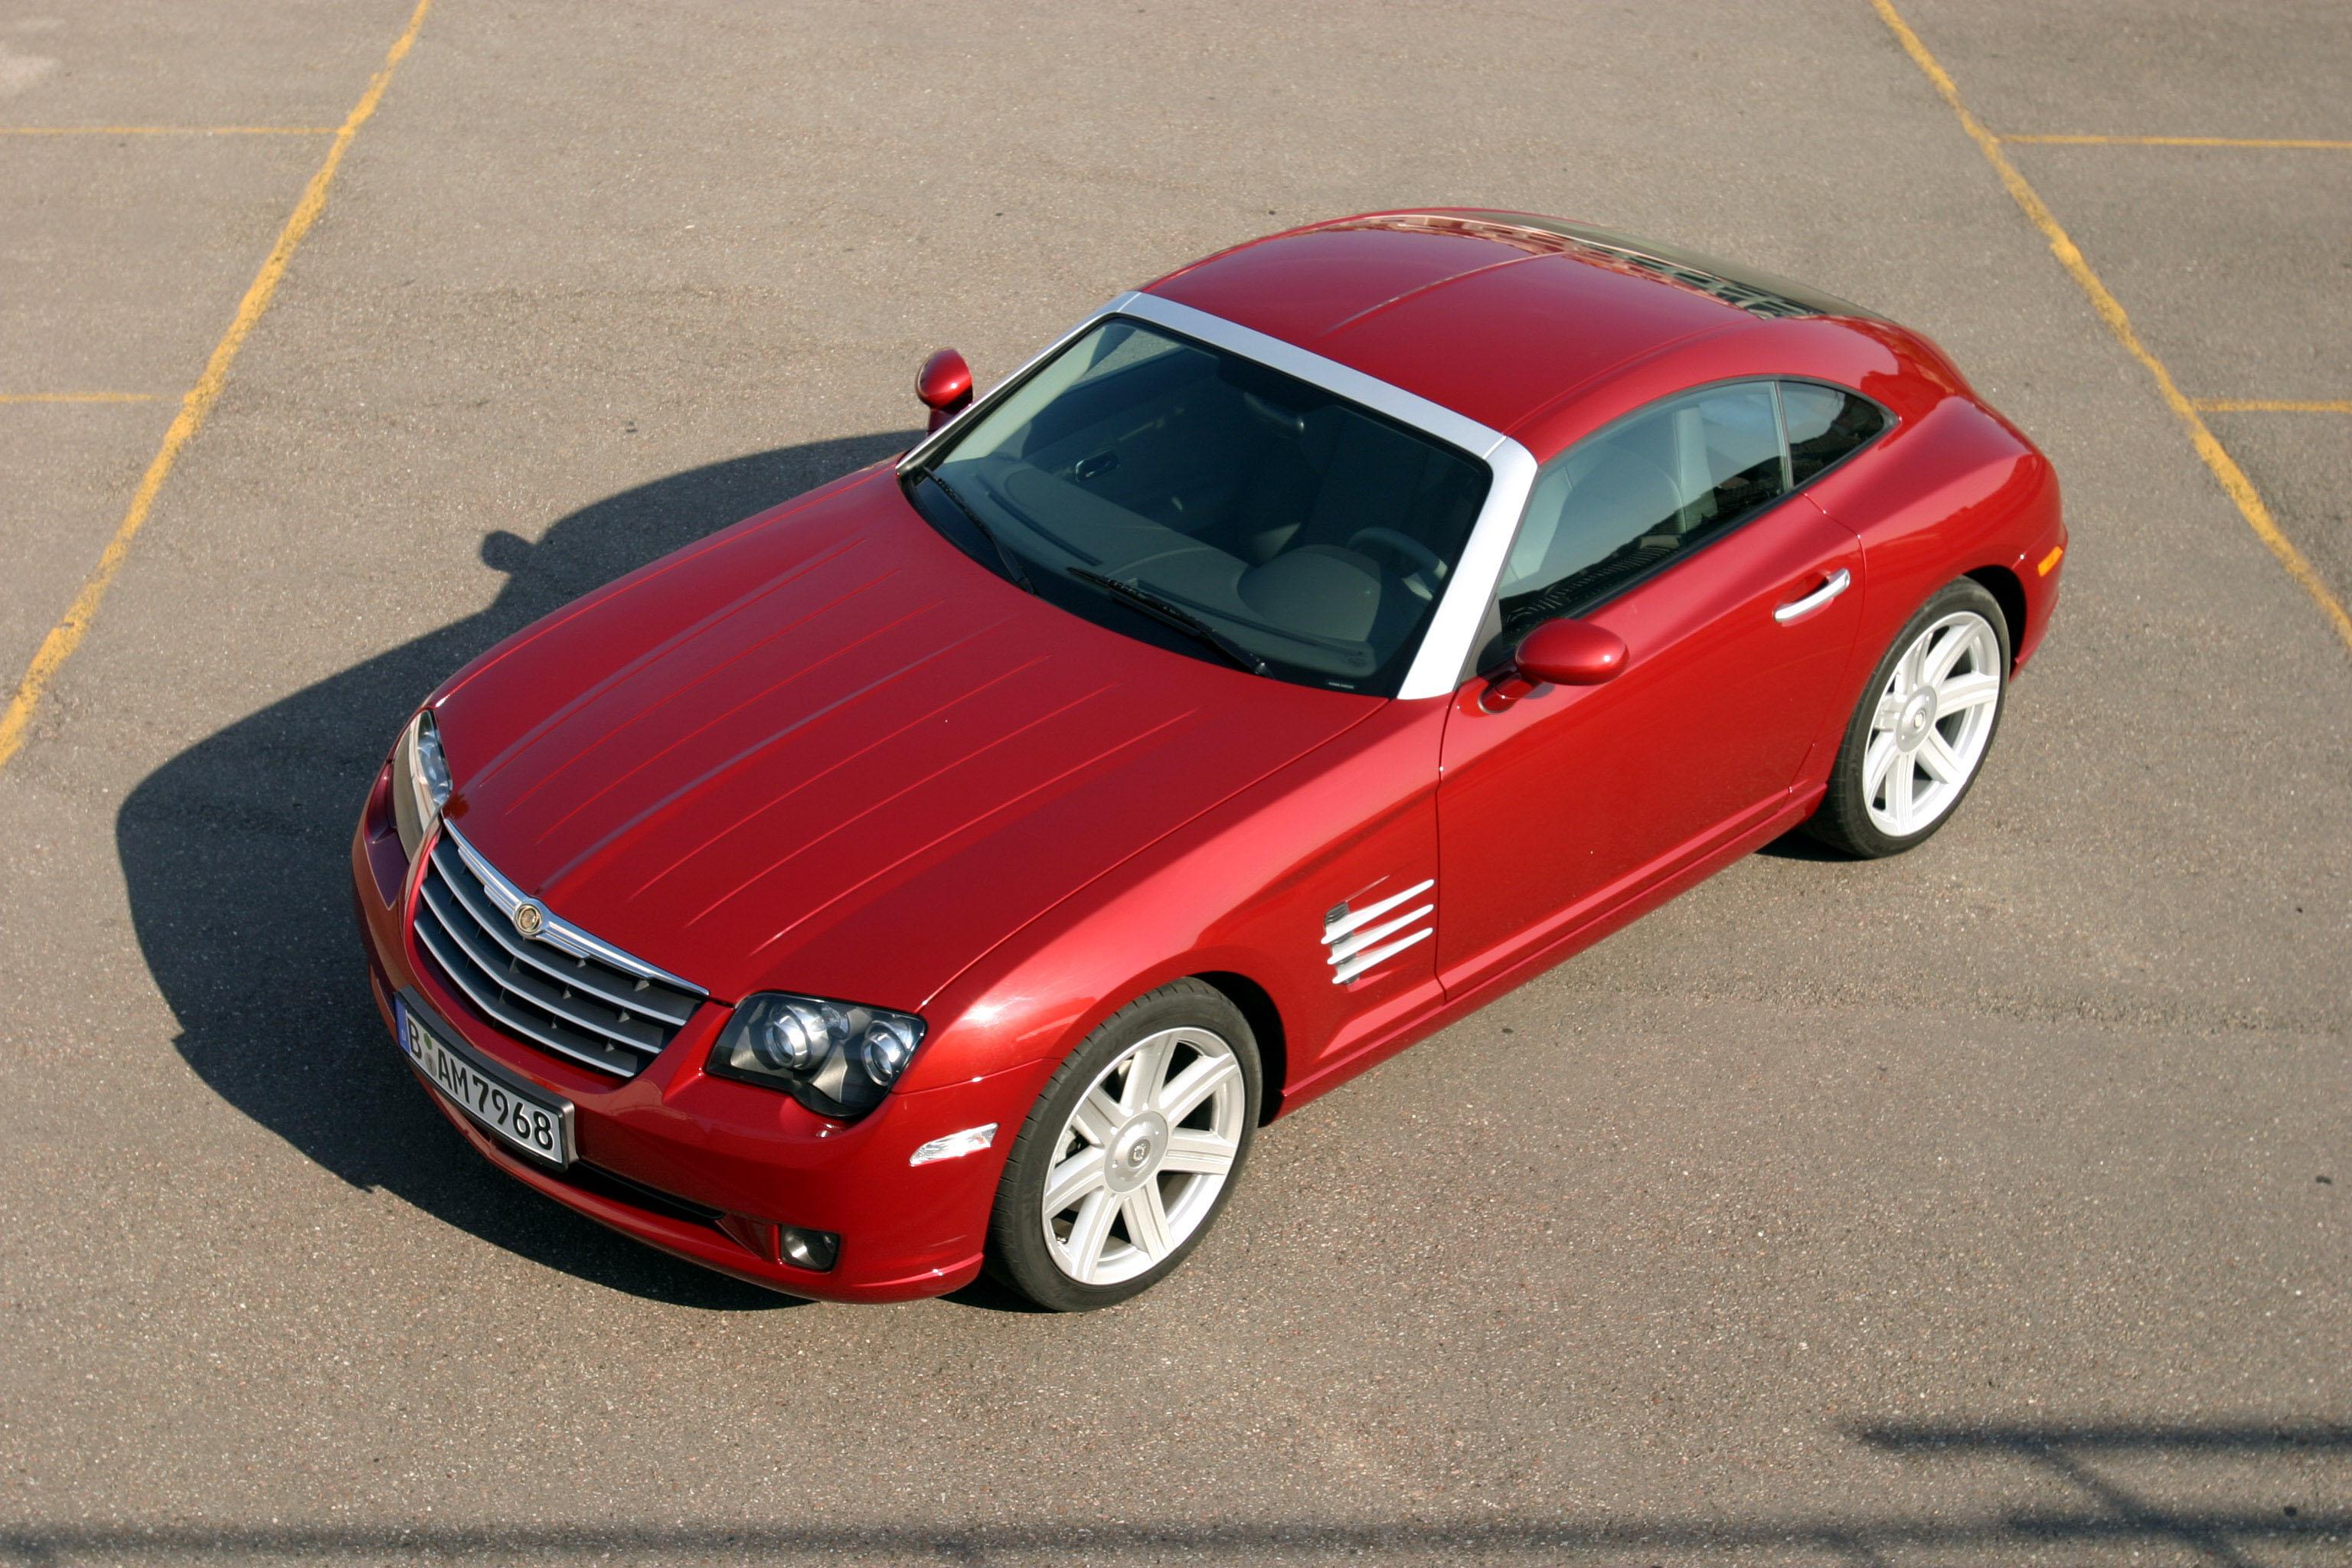 Chrysler Crossfire Buyer's Guide